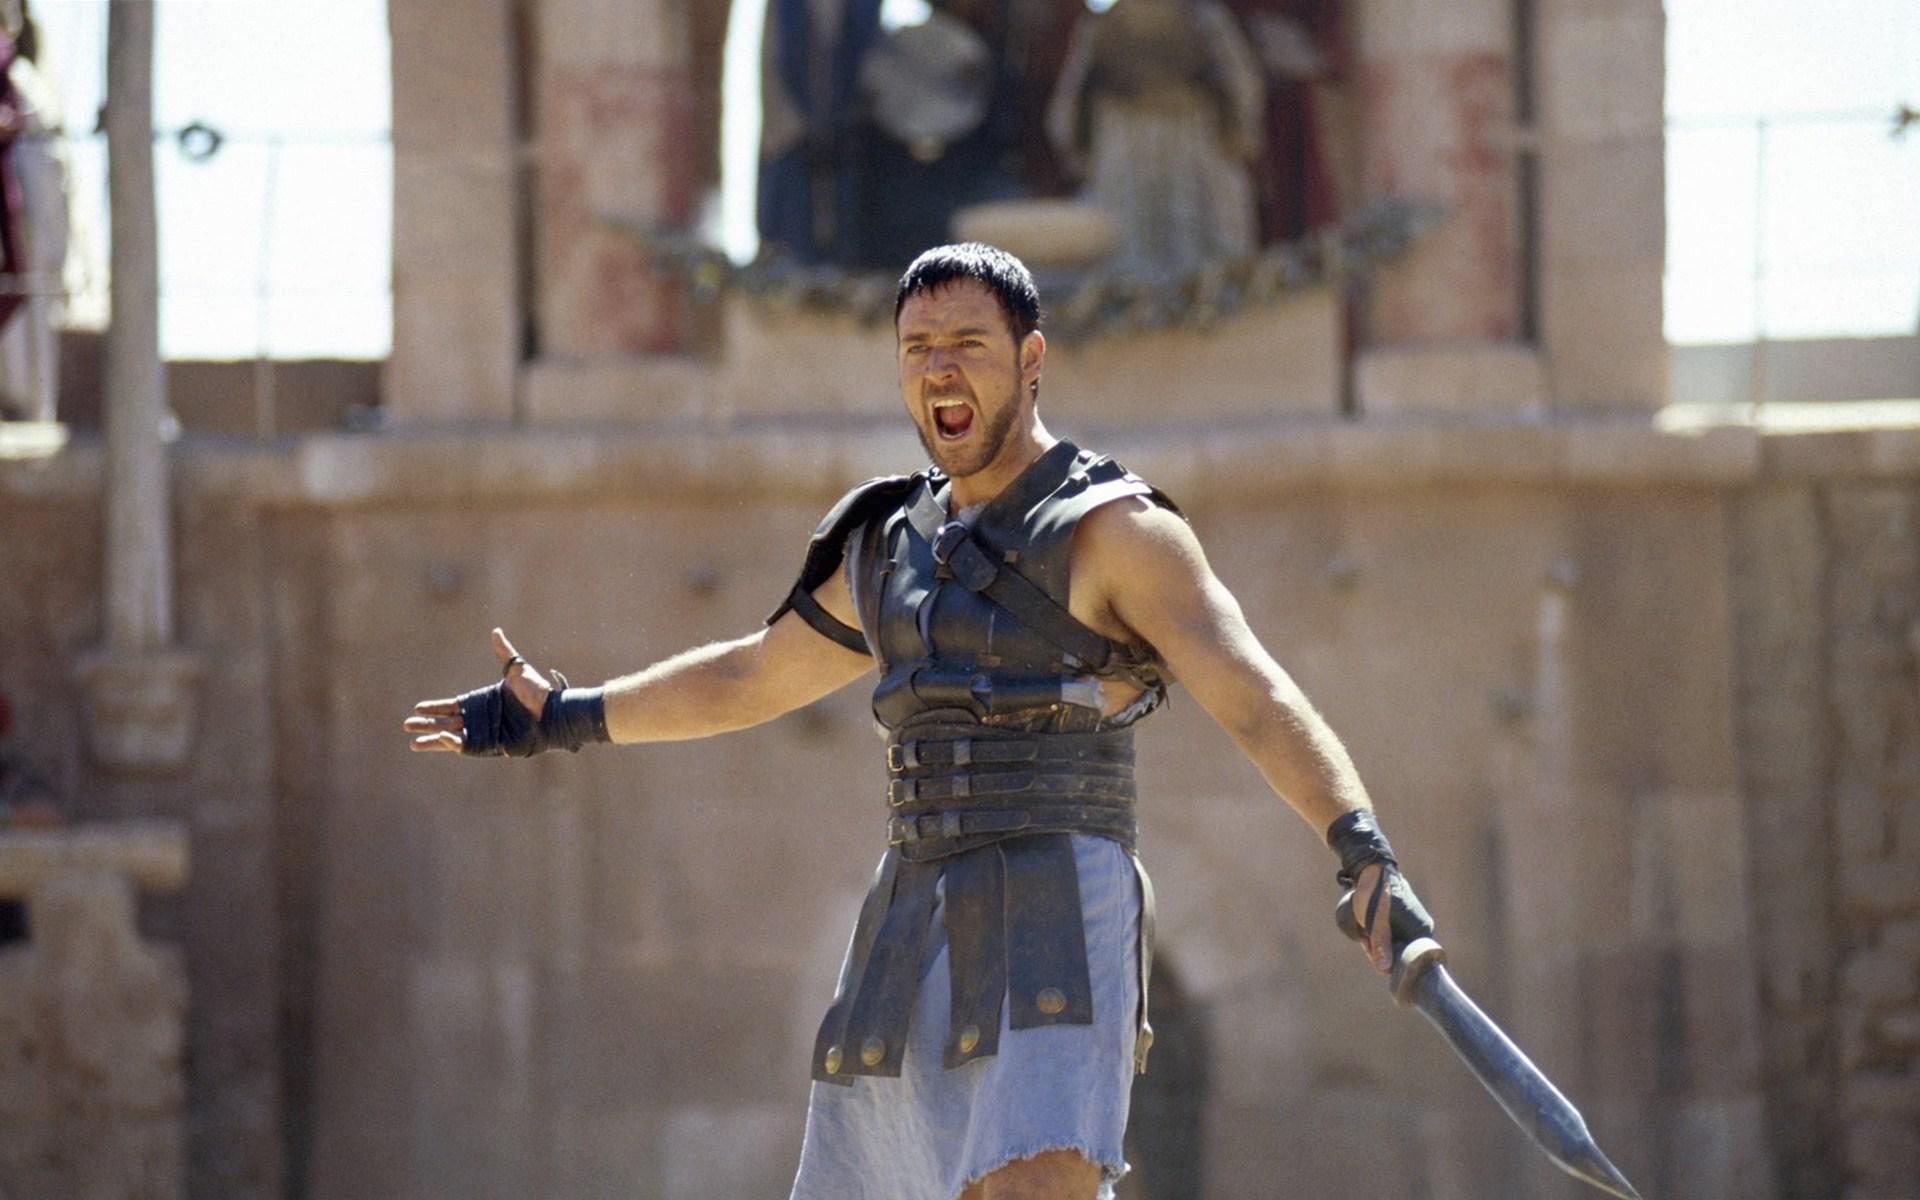 gladiator - photo #12